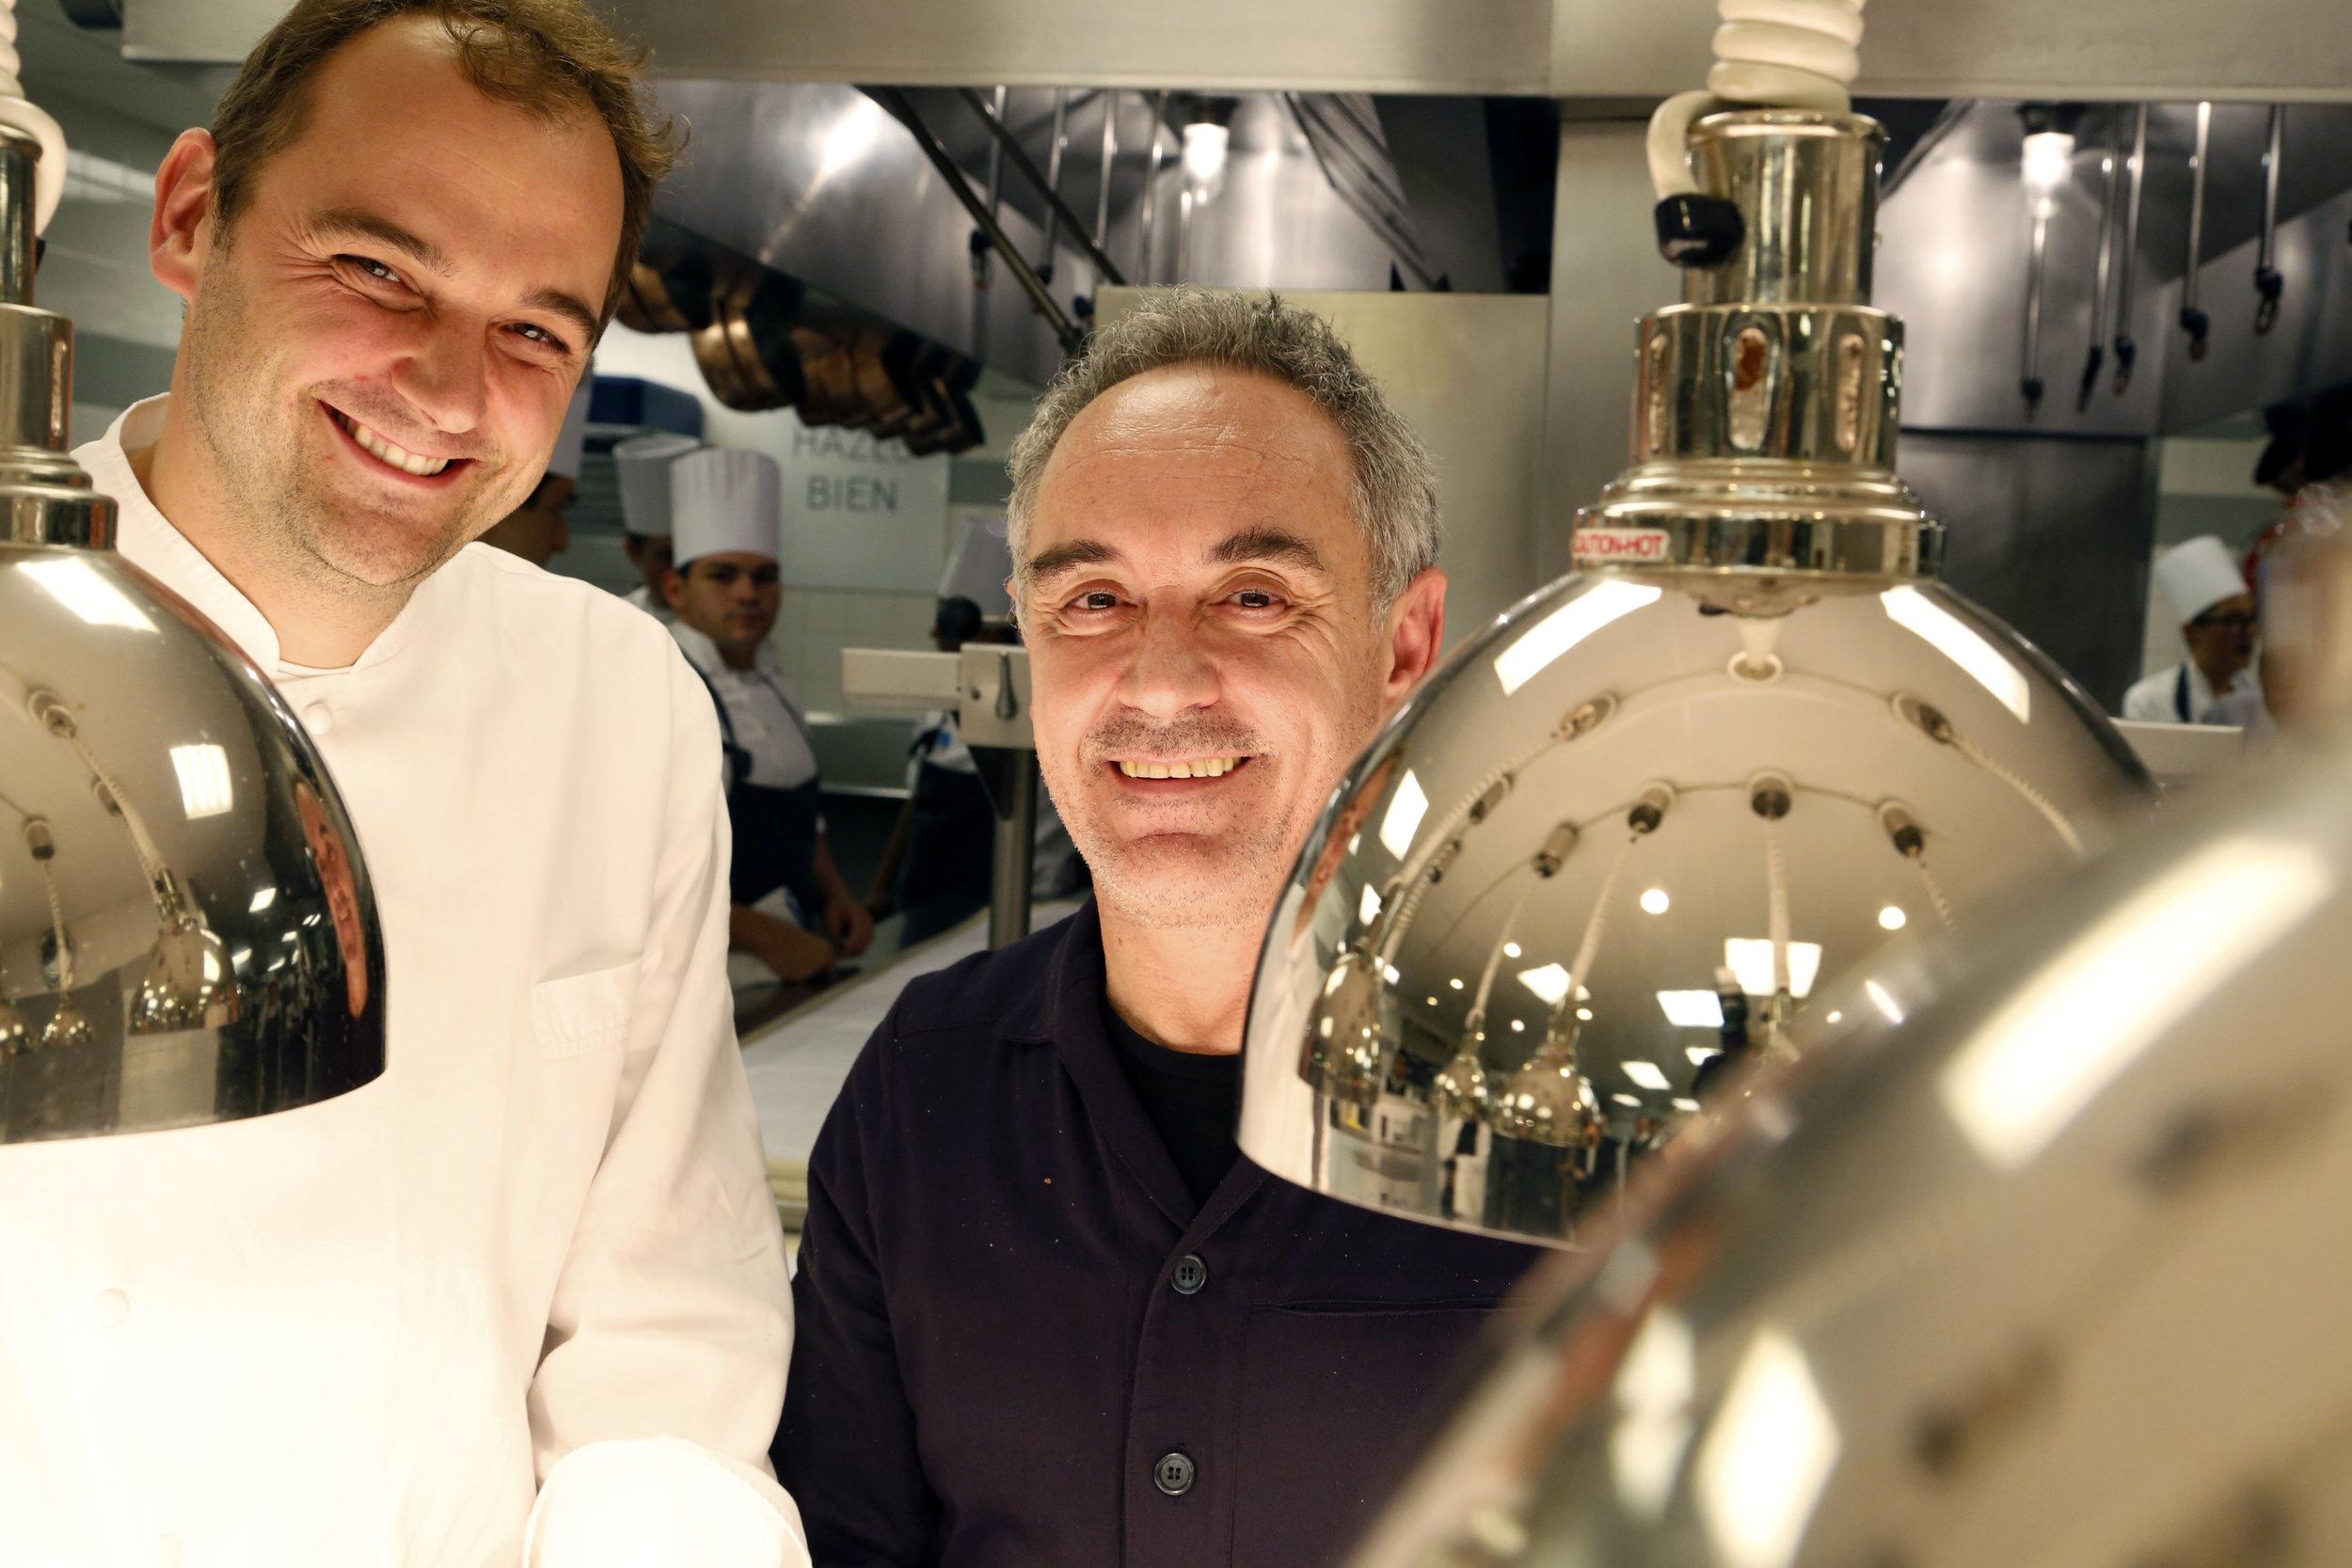 Chef Daniel Humm and Chef Ferran Adria at Eleven Madison Park, Fall 2014.